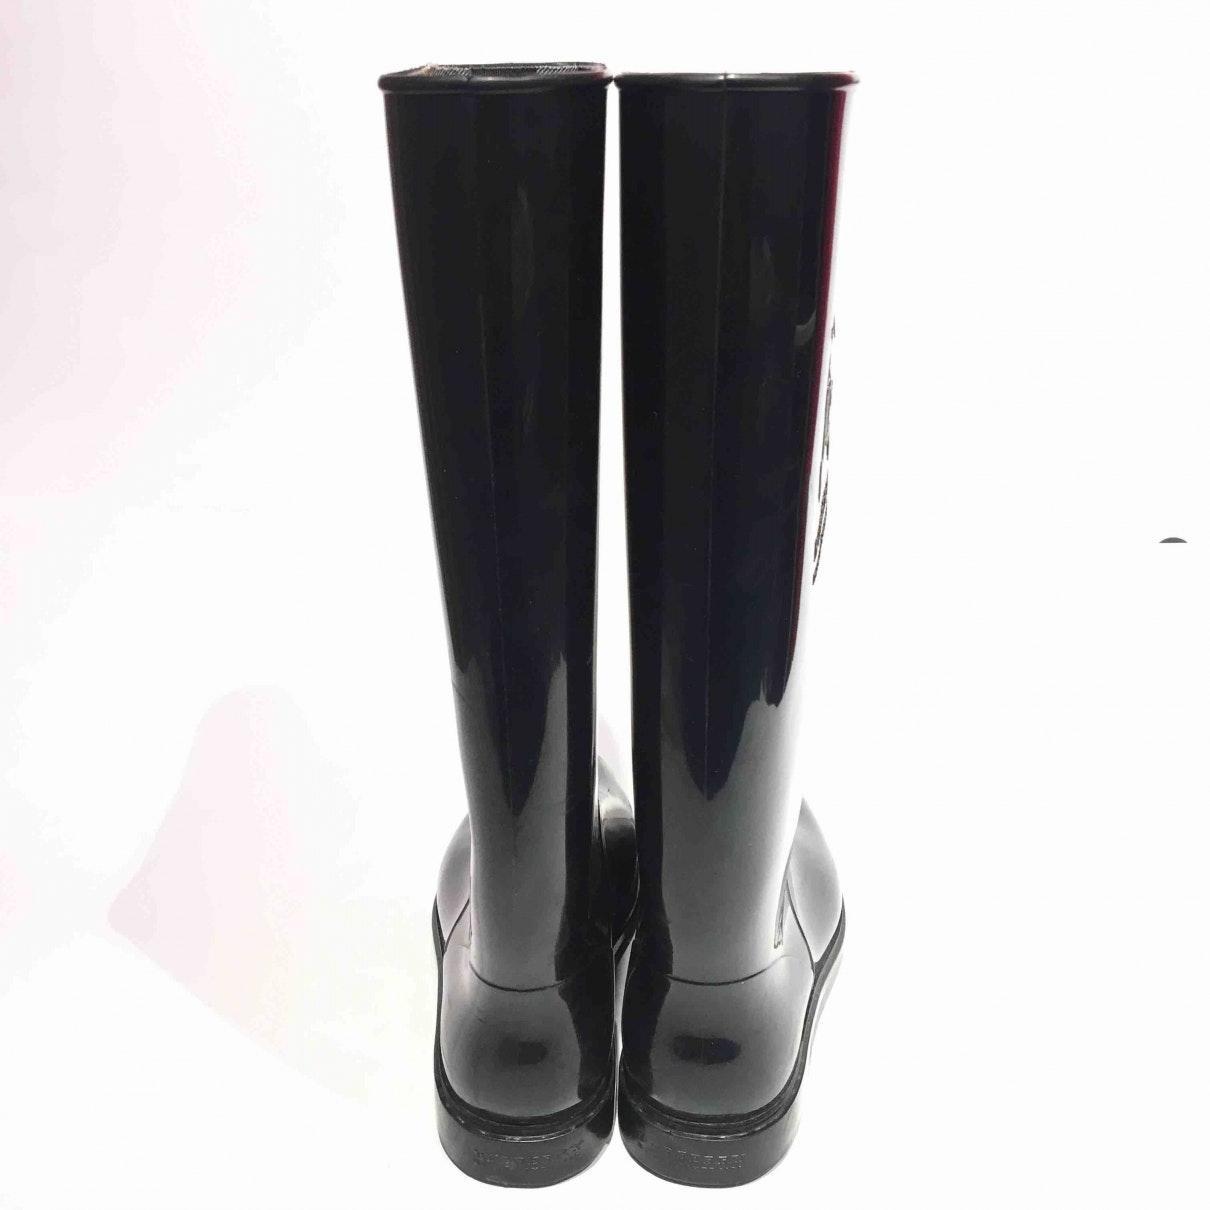 Botas en caucho negro Burberry de Caucho de color Negro